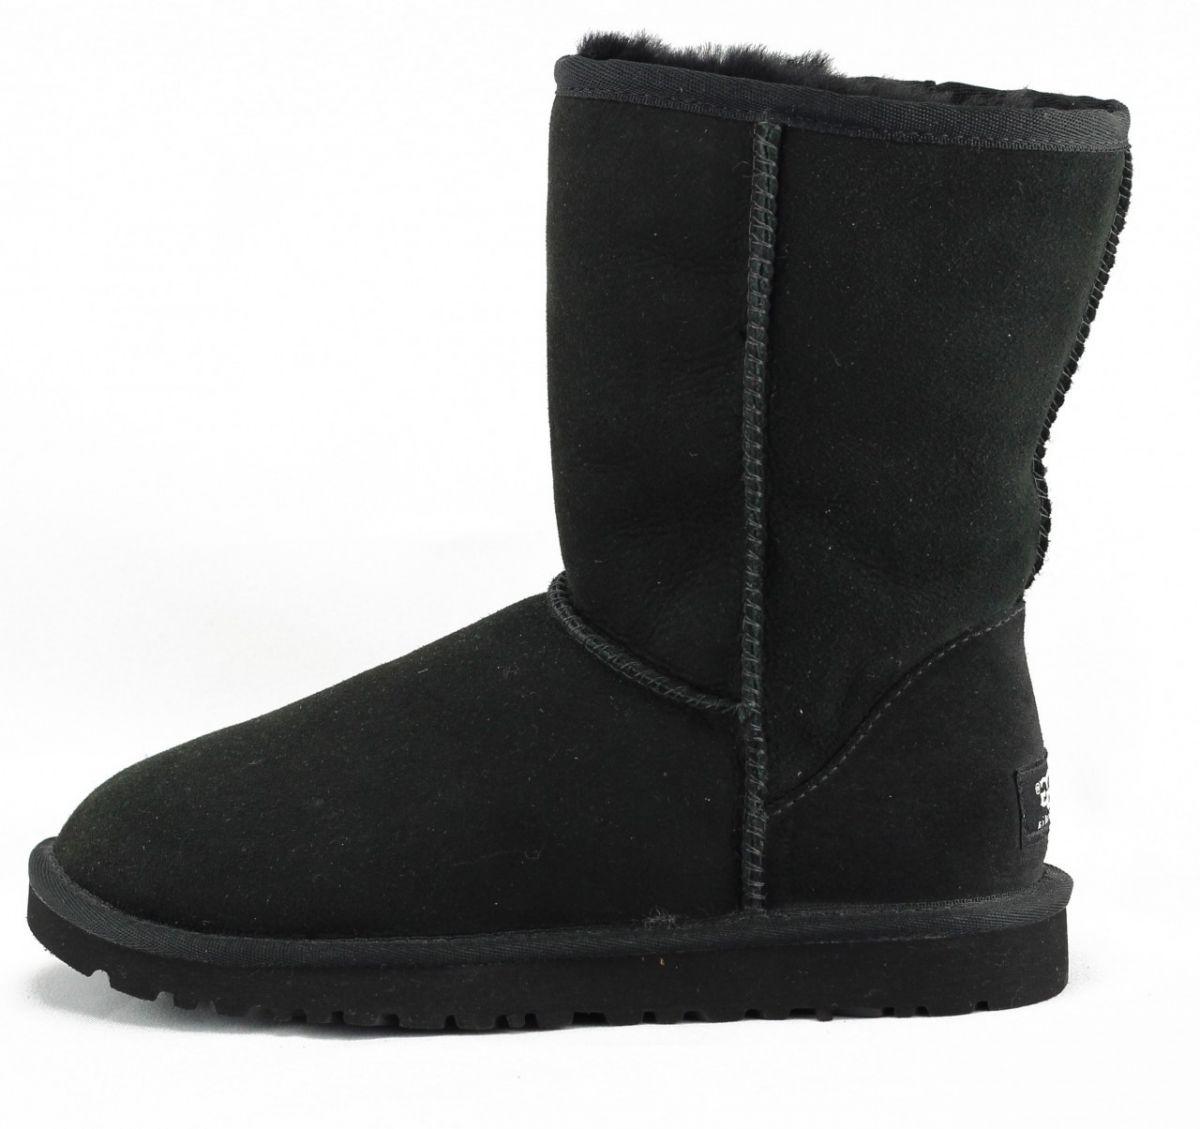 333adf3e0a6 UGG Australia for Women: Classic Short Black Boot BLACK